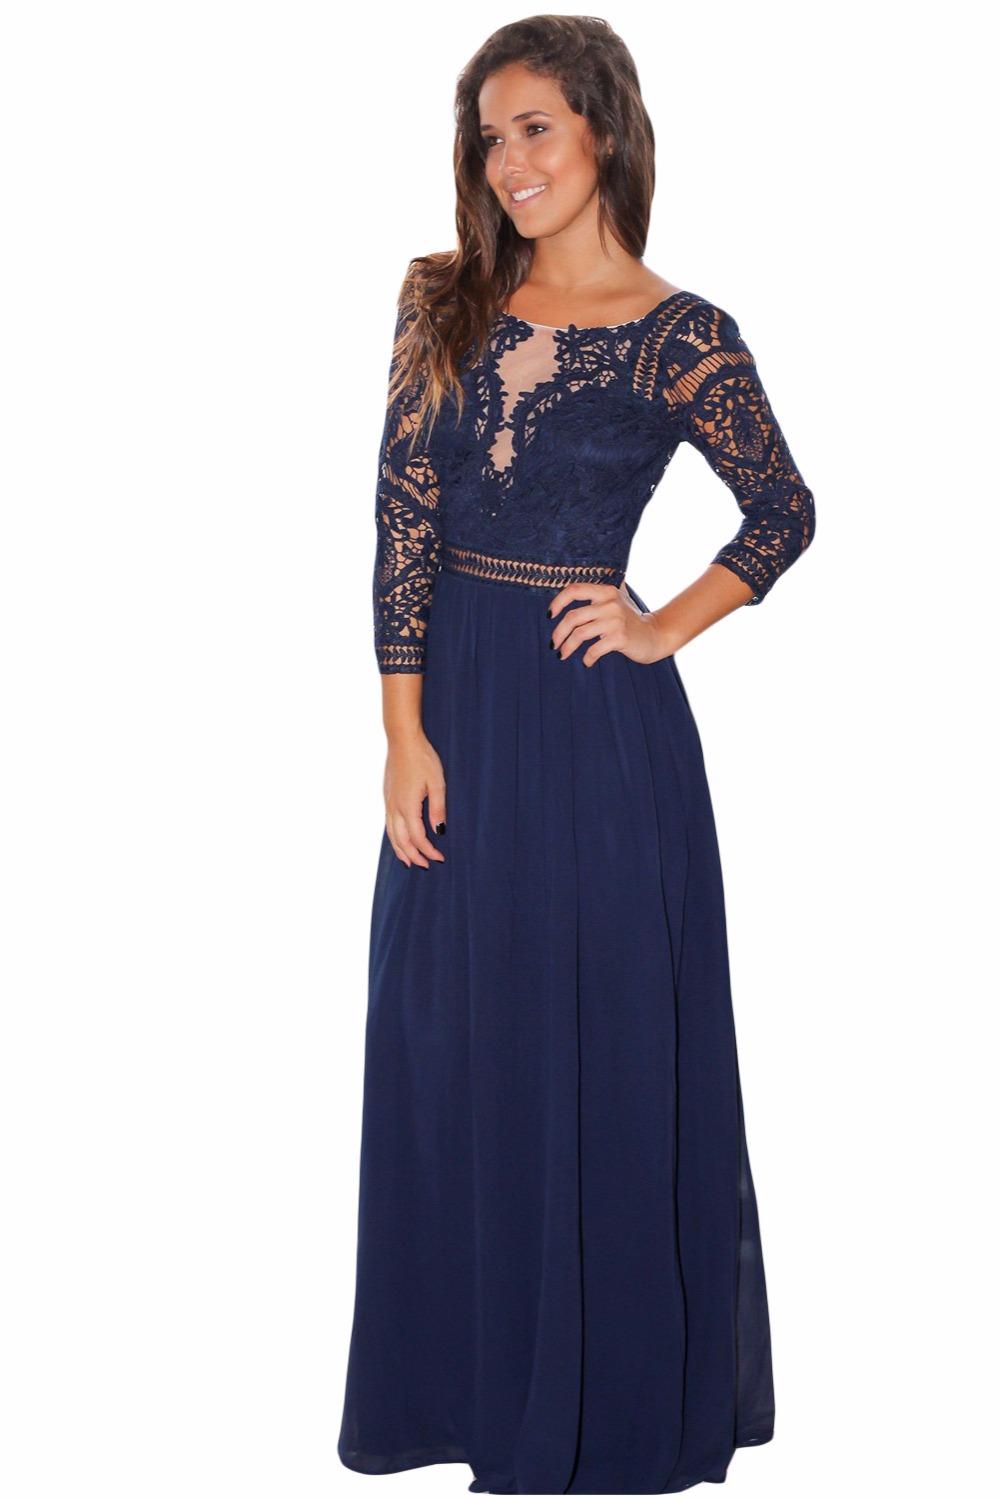 Dear Lover Elegant Long Dress Womens Autumn Navy Black Lace Crochet ... 926ce171f7